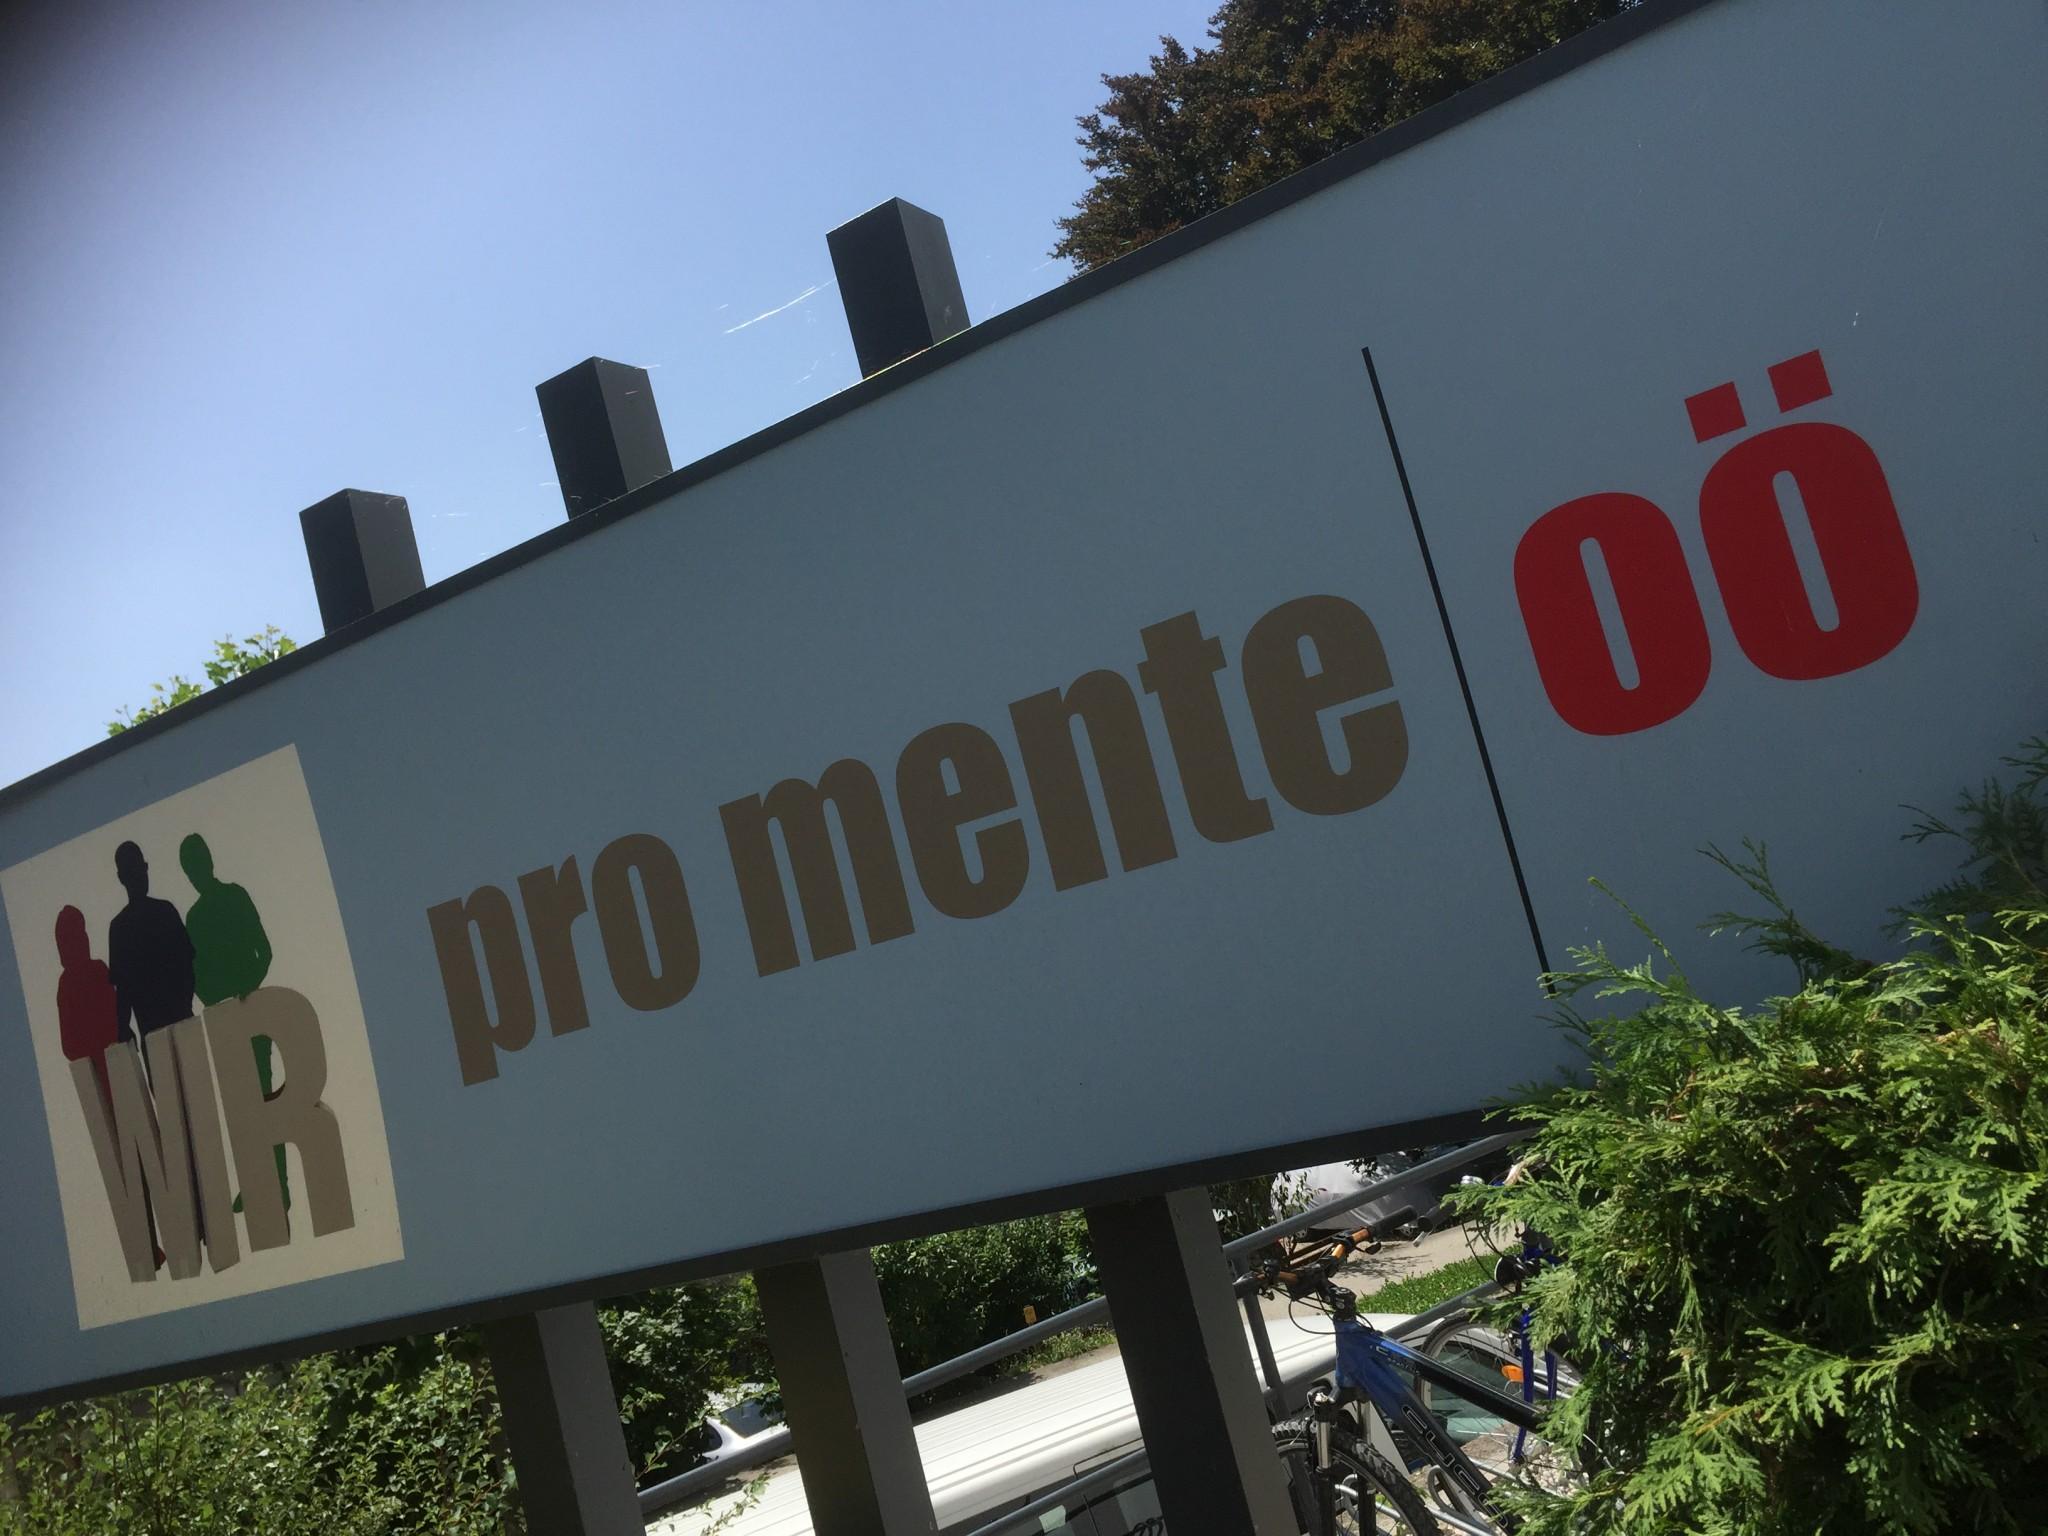 Fotonachmittag bei ProMente in Gmunden